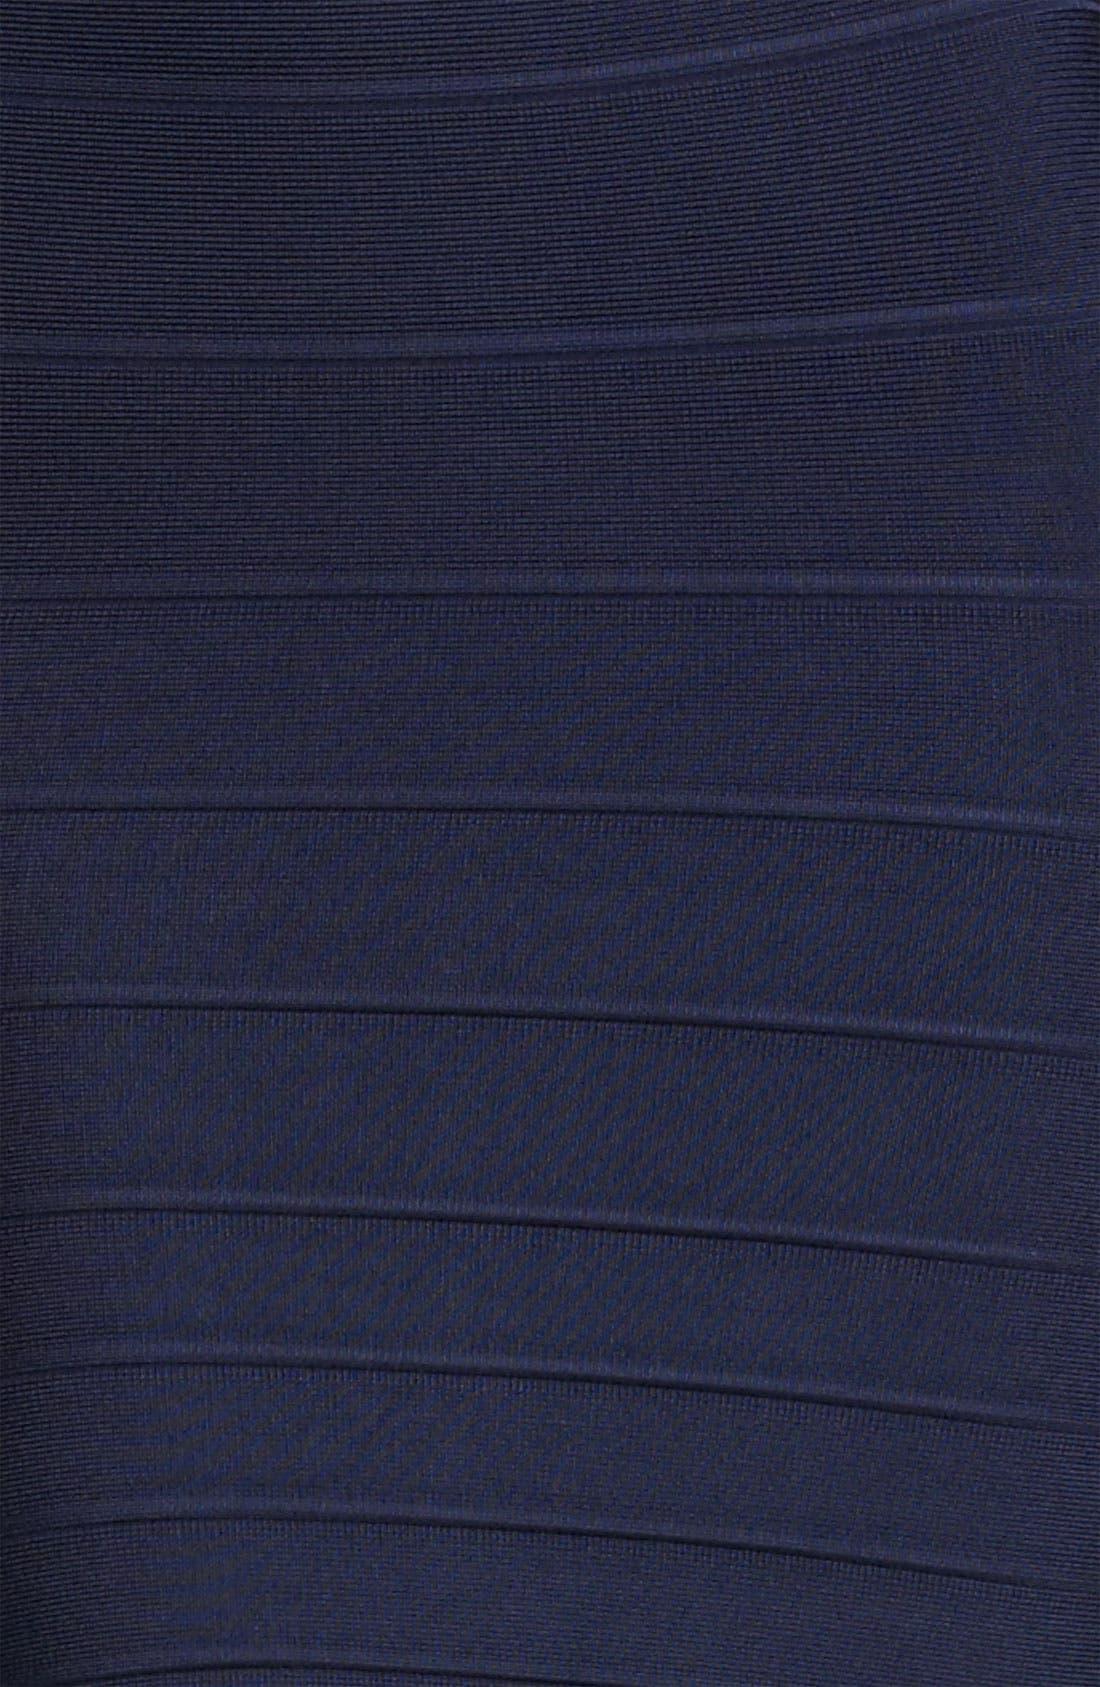 Alternate Image 3  - Herve Leger Cap Sleeve Bandage Dress